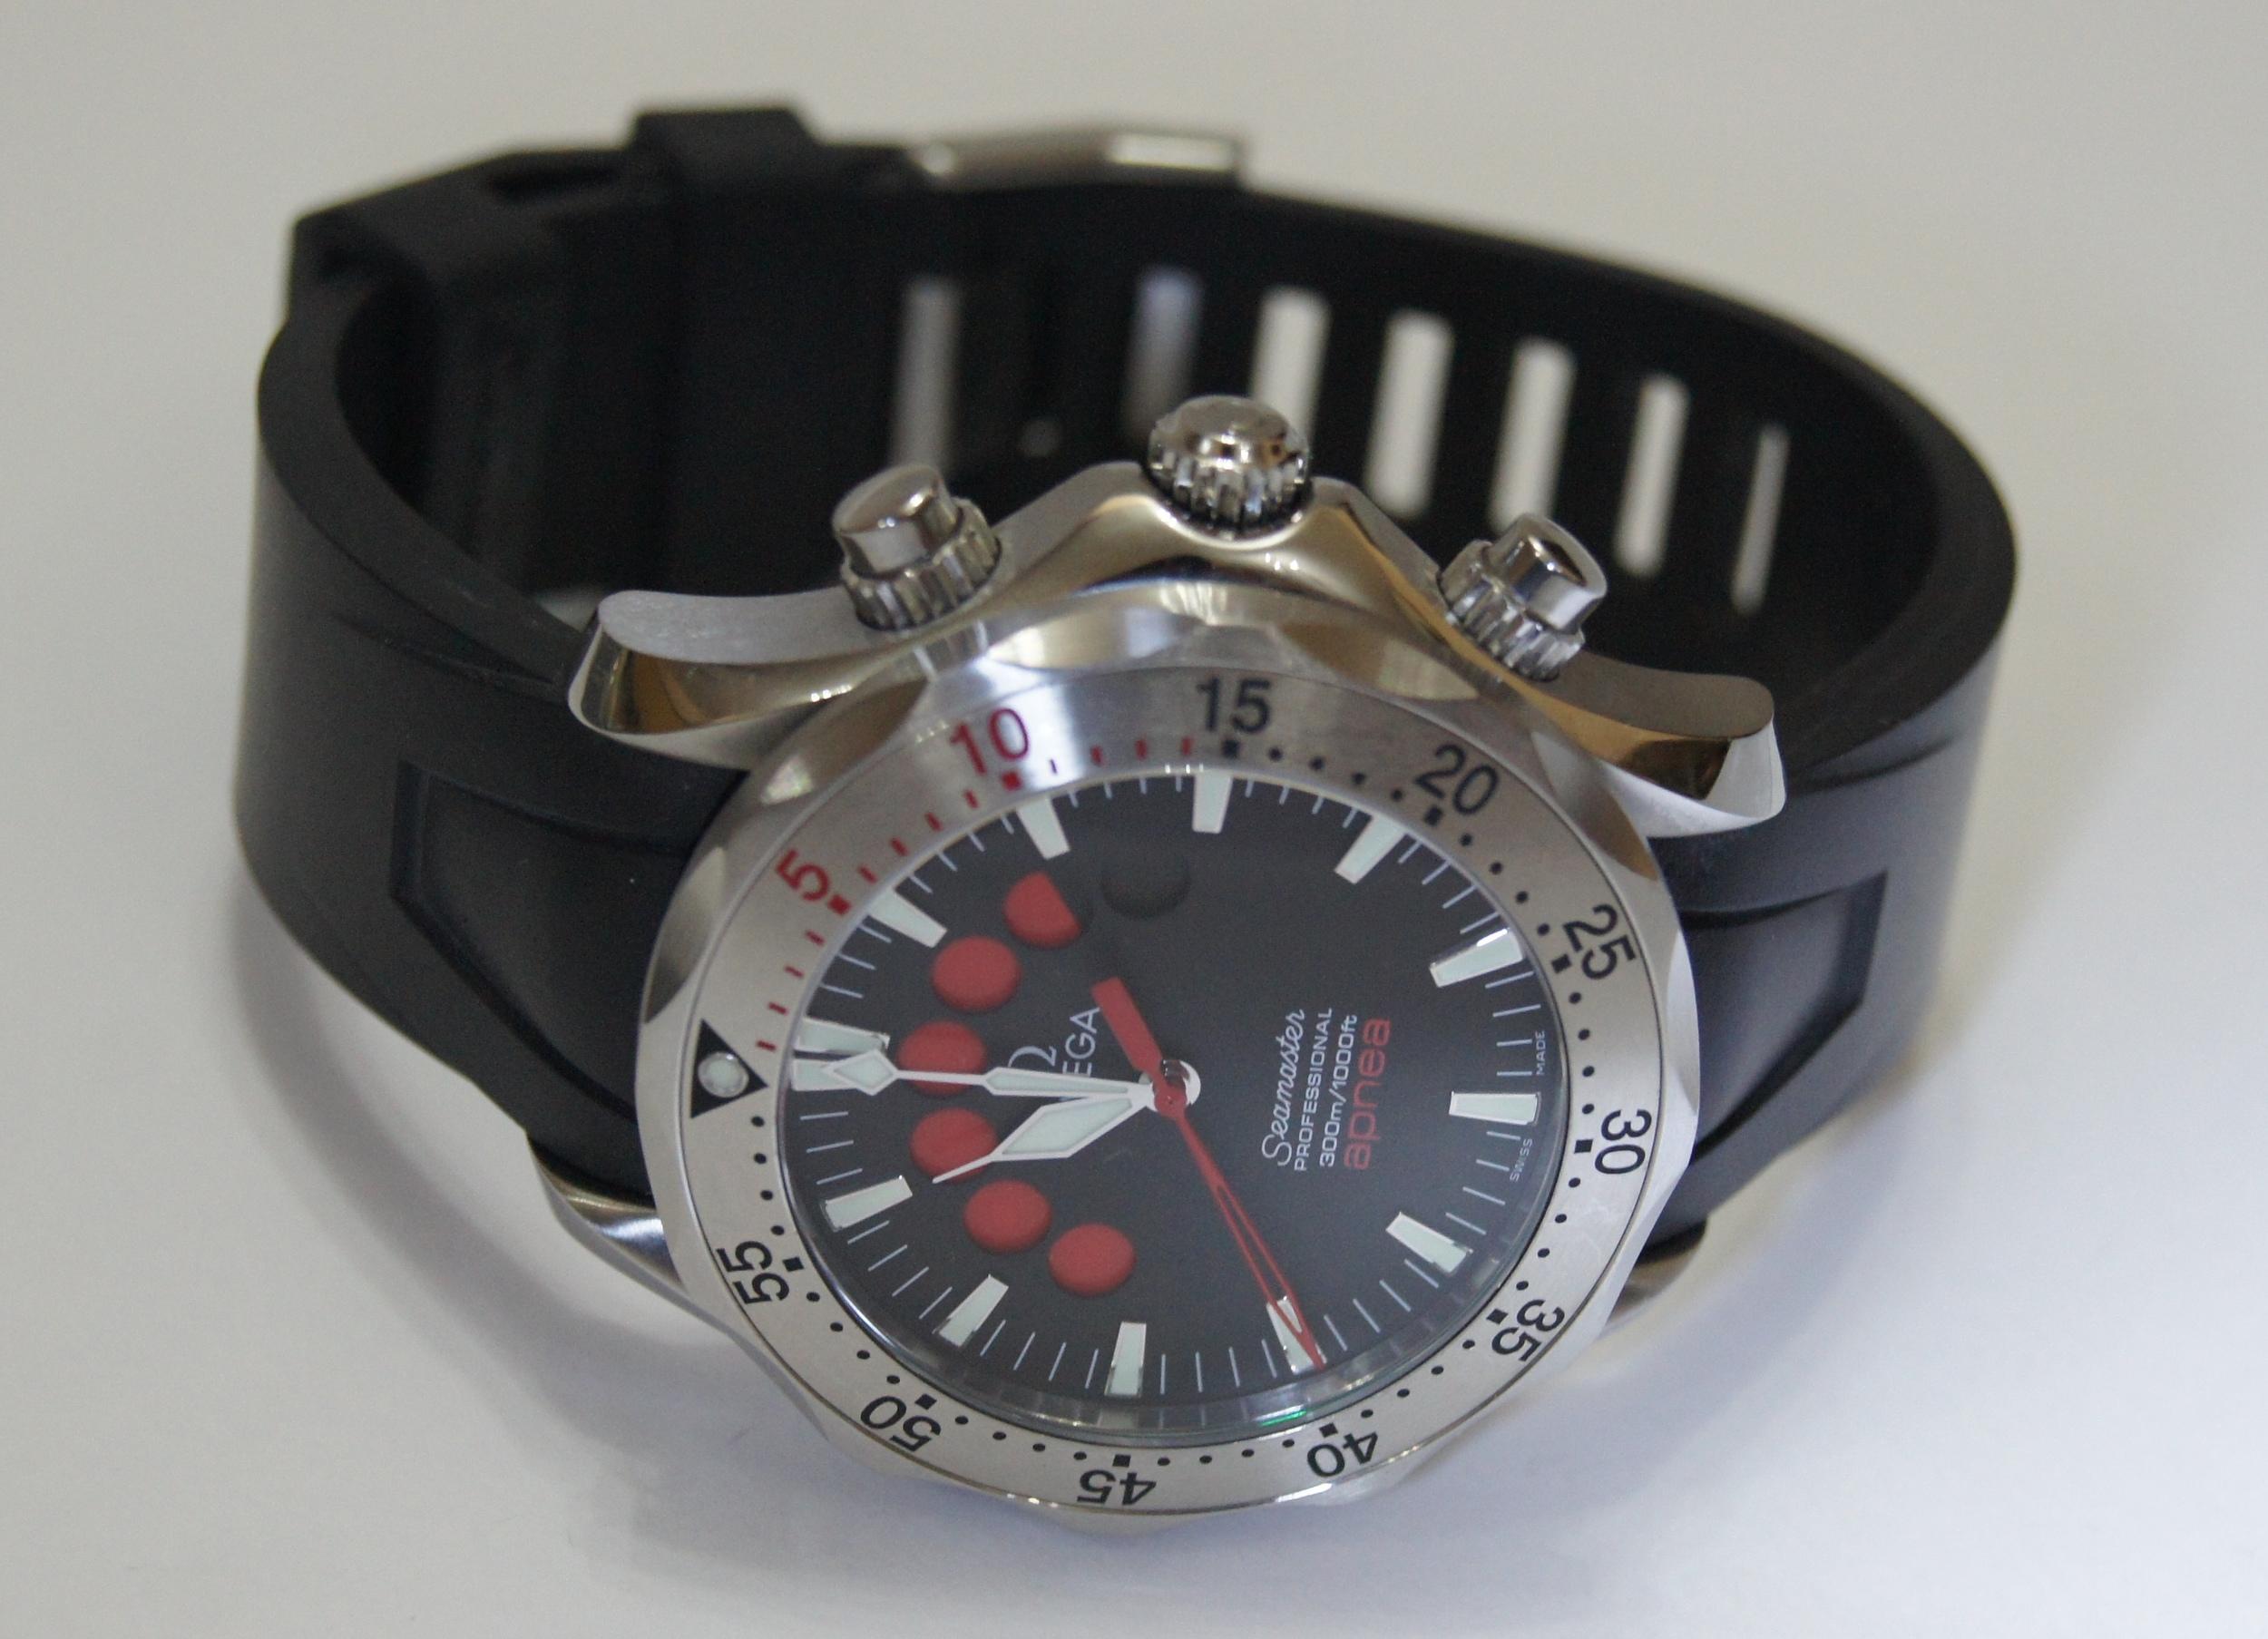 Omega Apnea - Diver Series